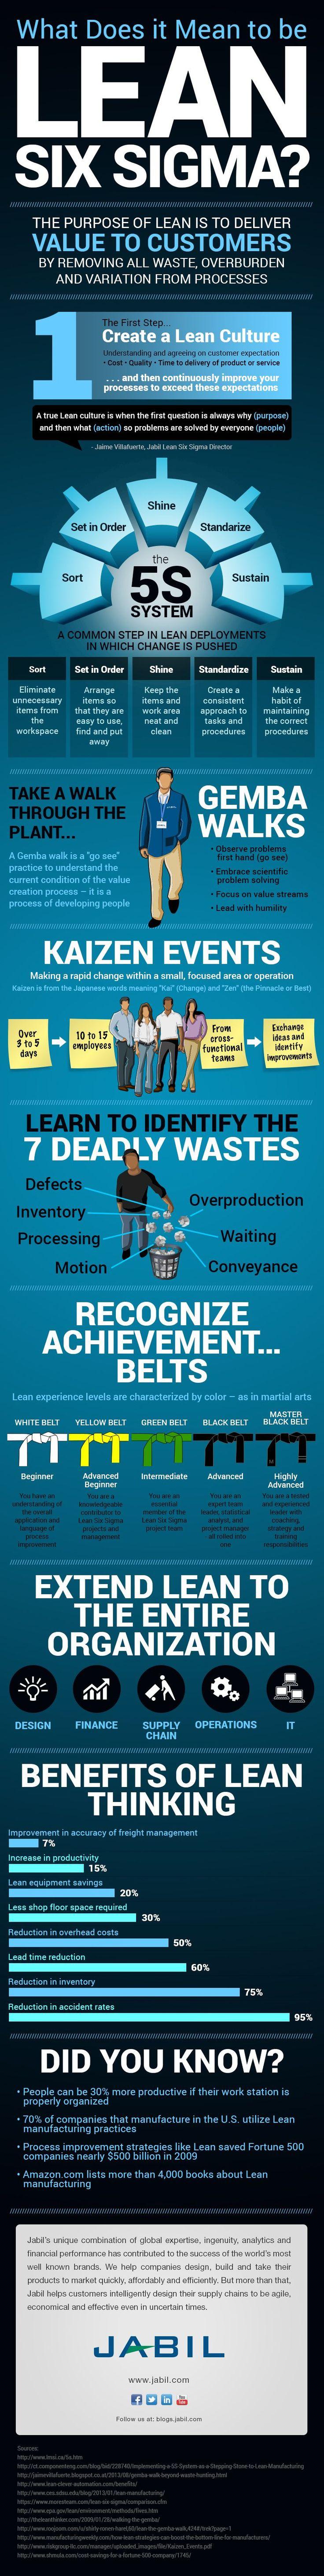 Lean Six Sigma Infographic | Jabil Blog: Aim Higher